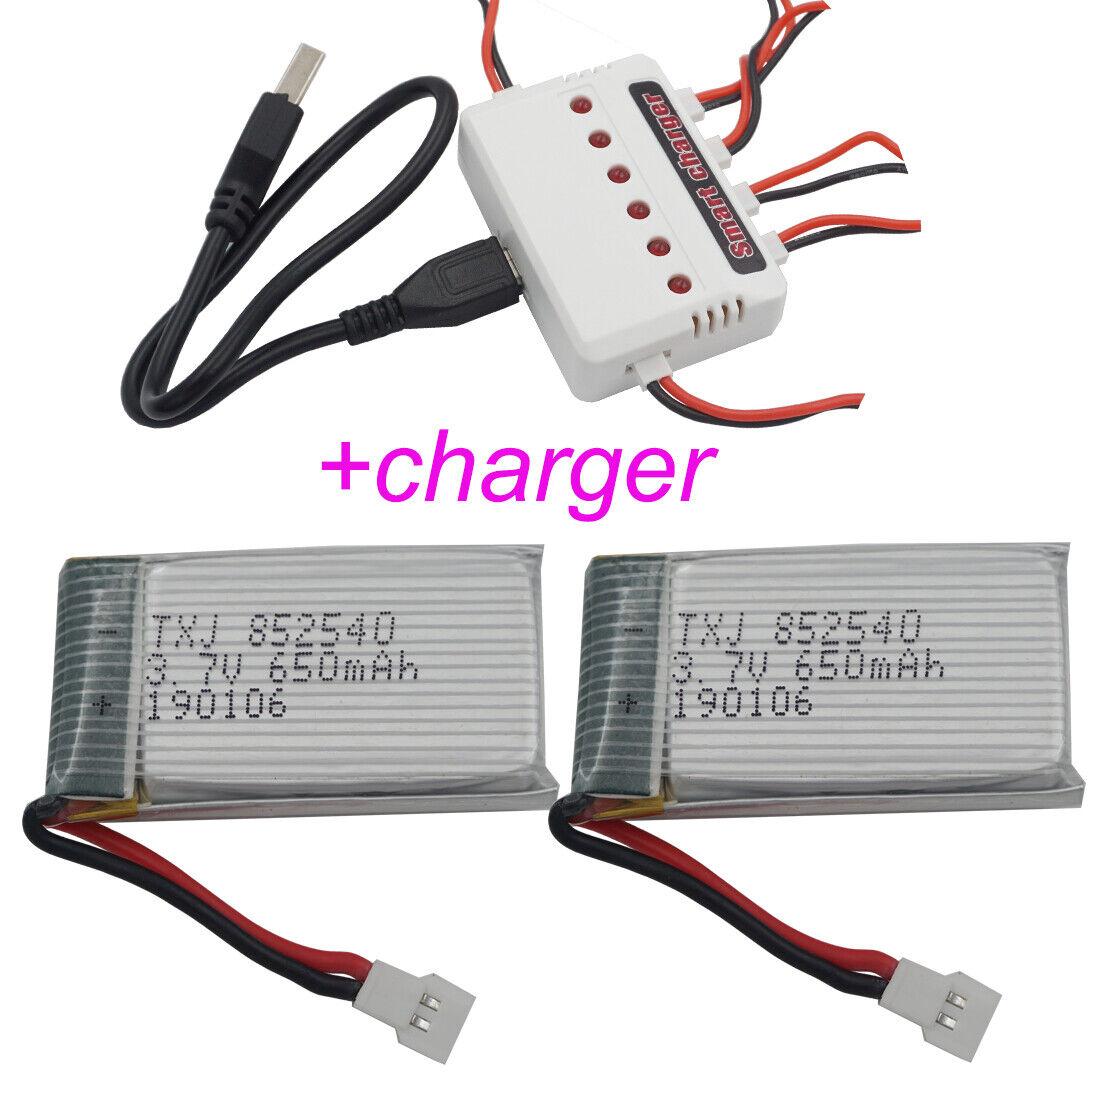 3.7V 650mAh 25C Li-Polymer Li ion battery+charger 852540 for syma Toys RC Drones